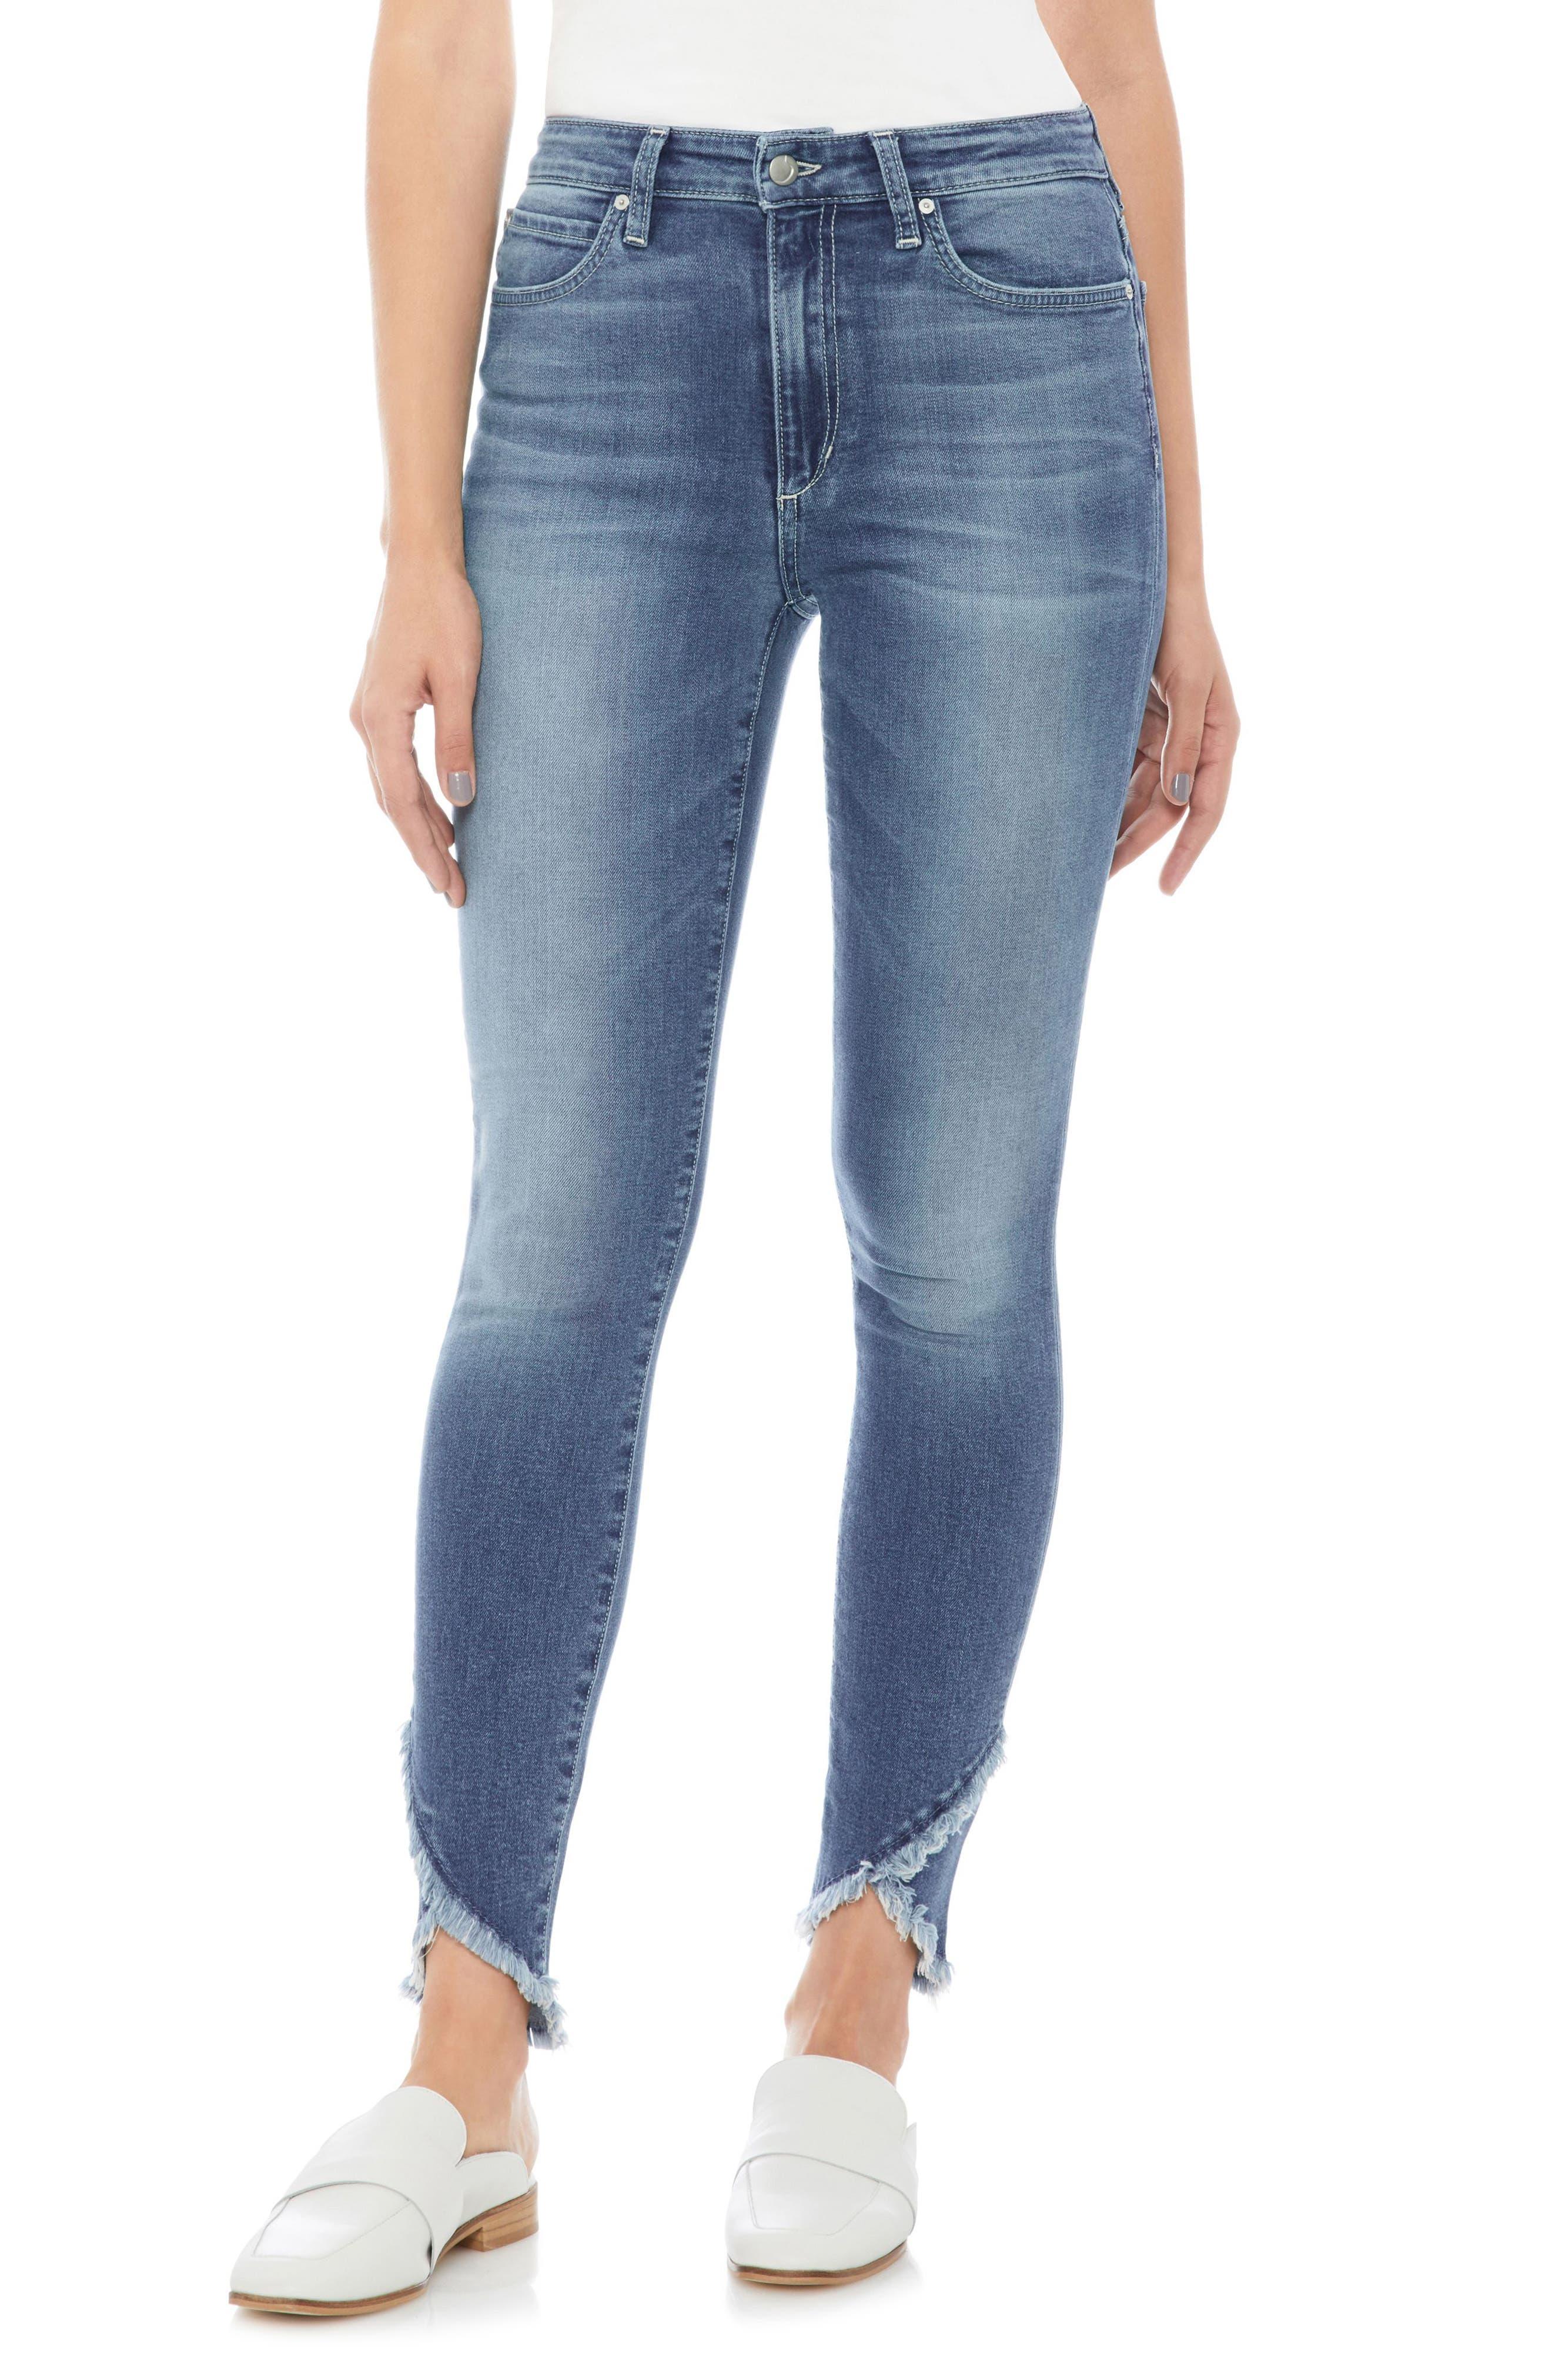 JOE'S,                             Charlie High Waist Tulip Hem Ankle Skinny Jeans,                             Main thumbnail 1, color,                             420